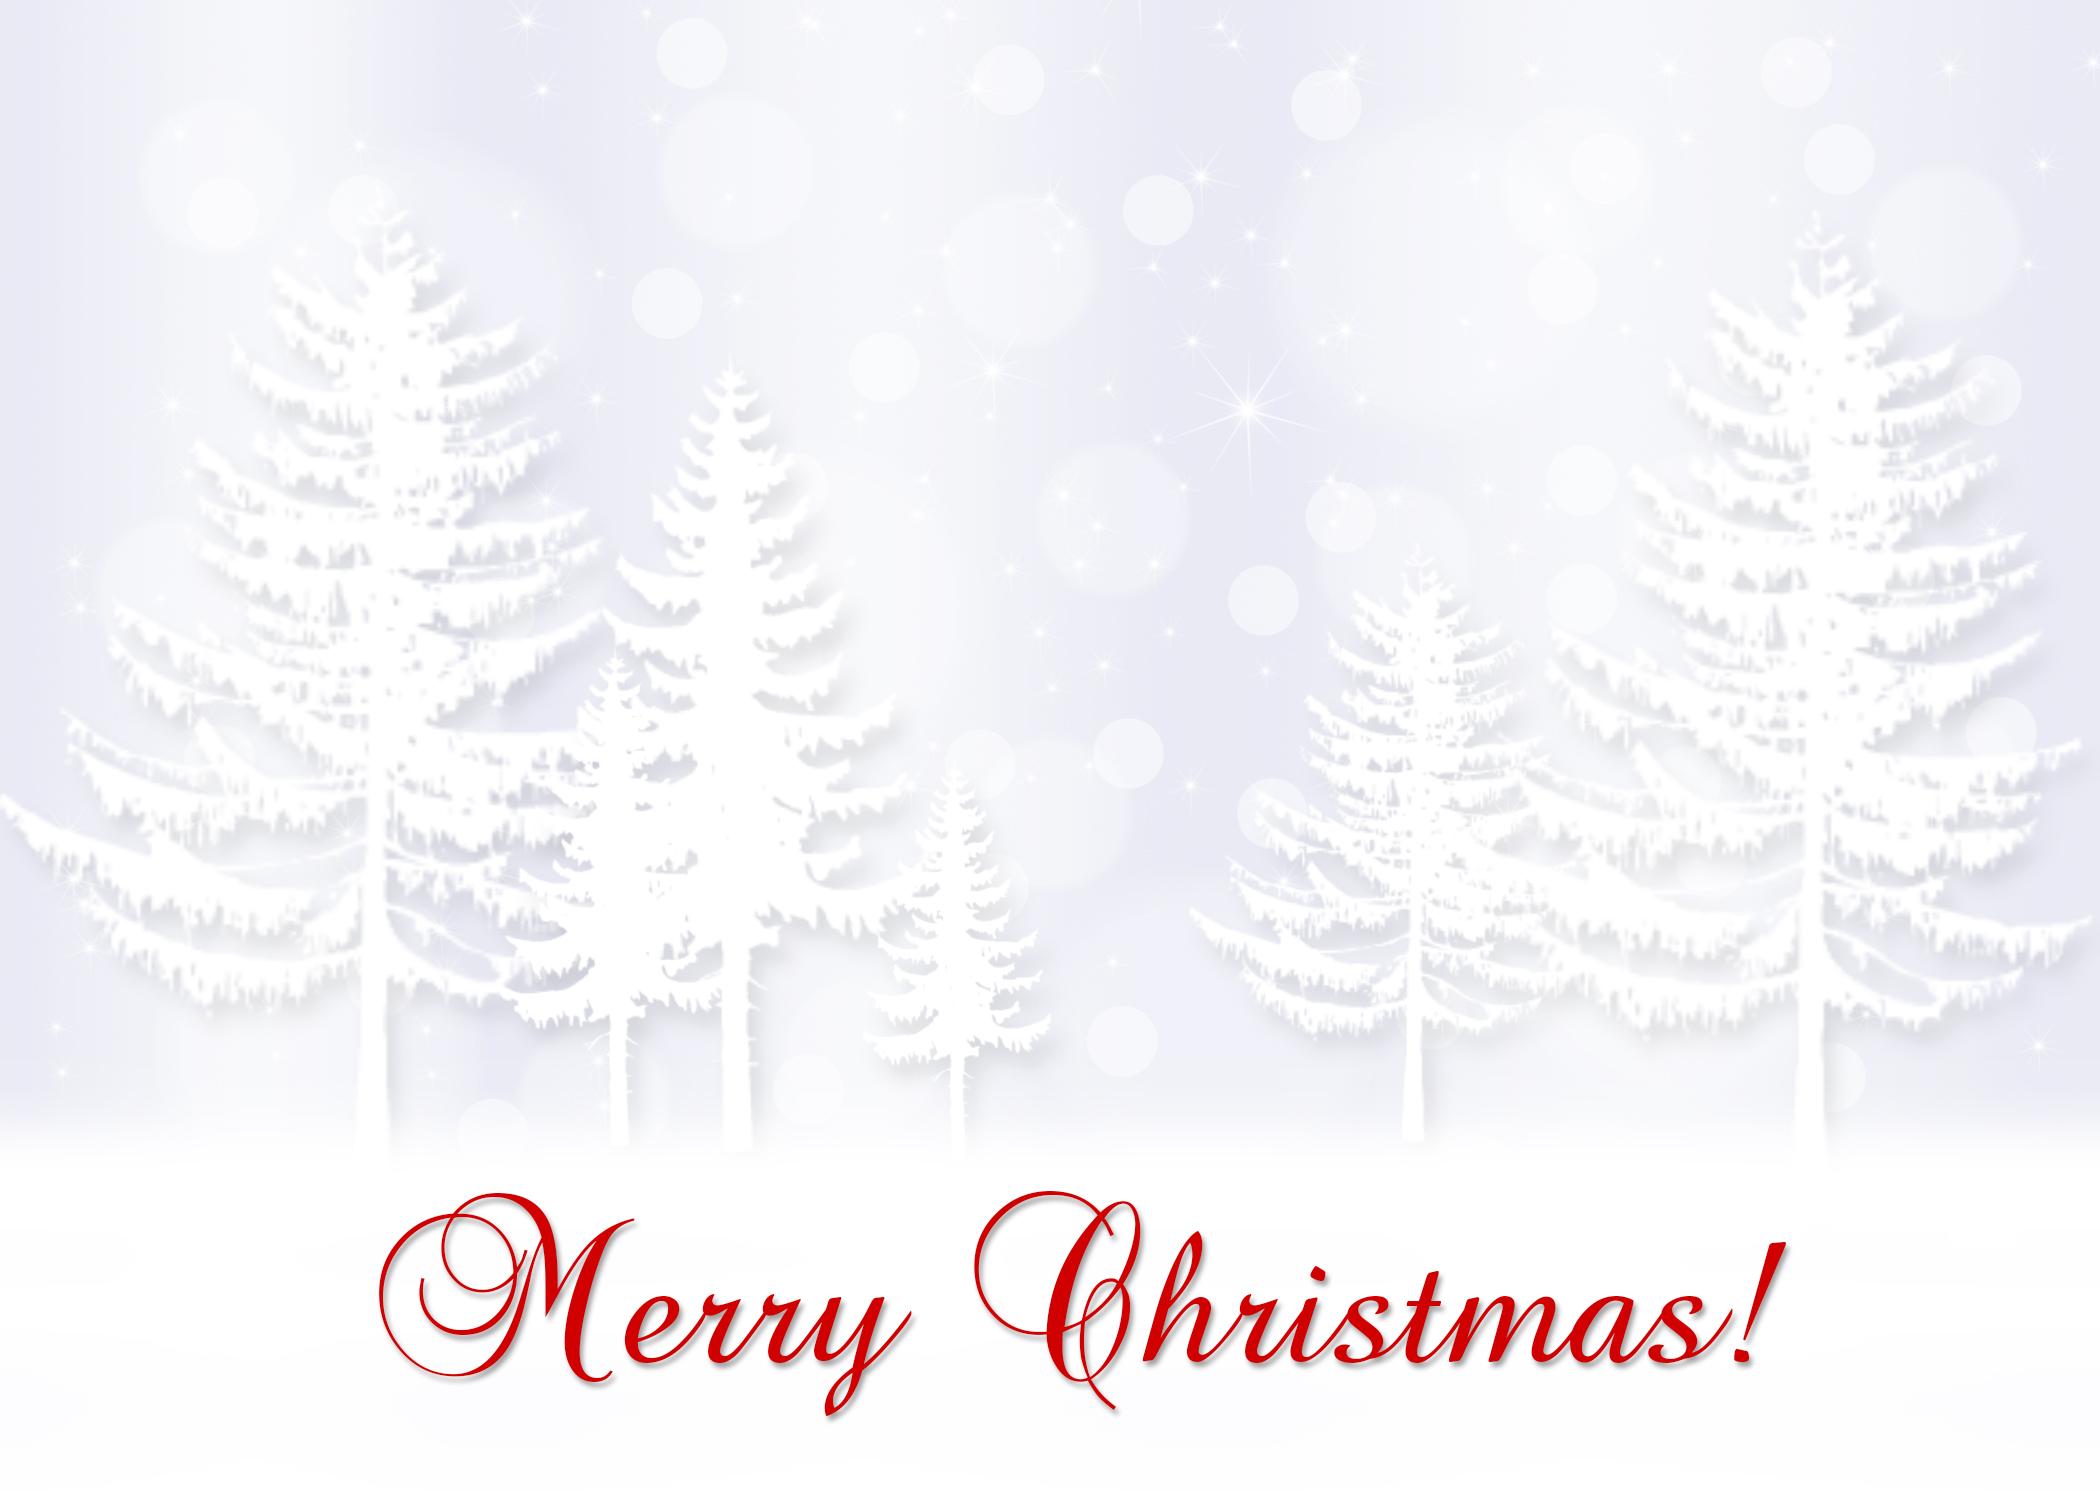 ChristmasTrees2013.jpg